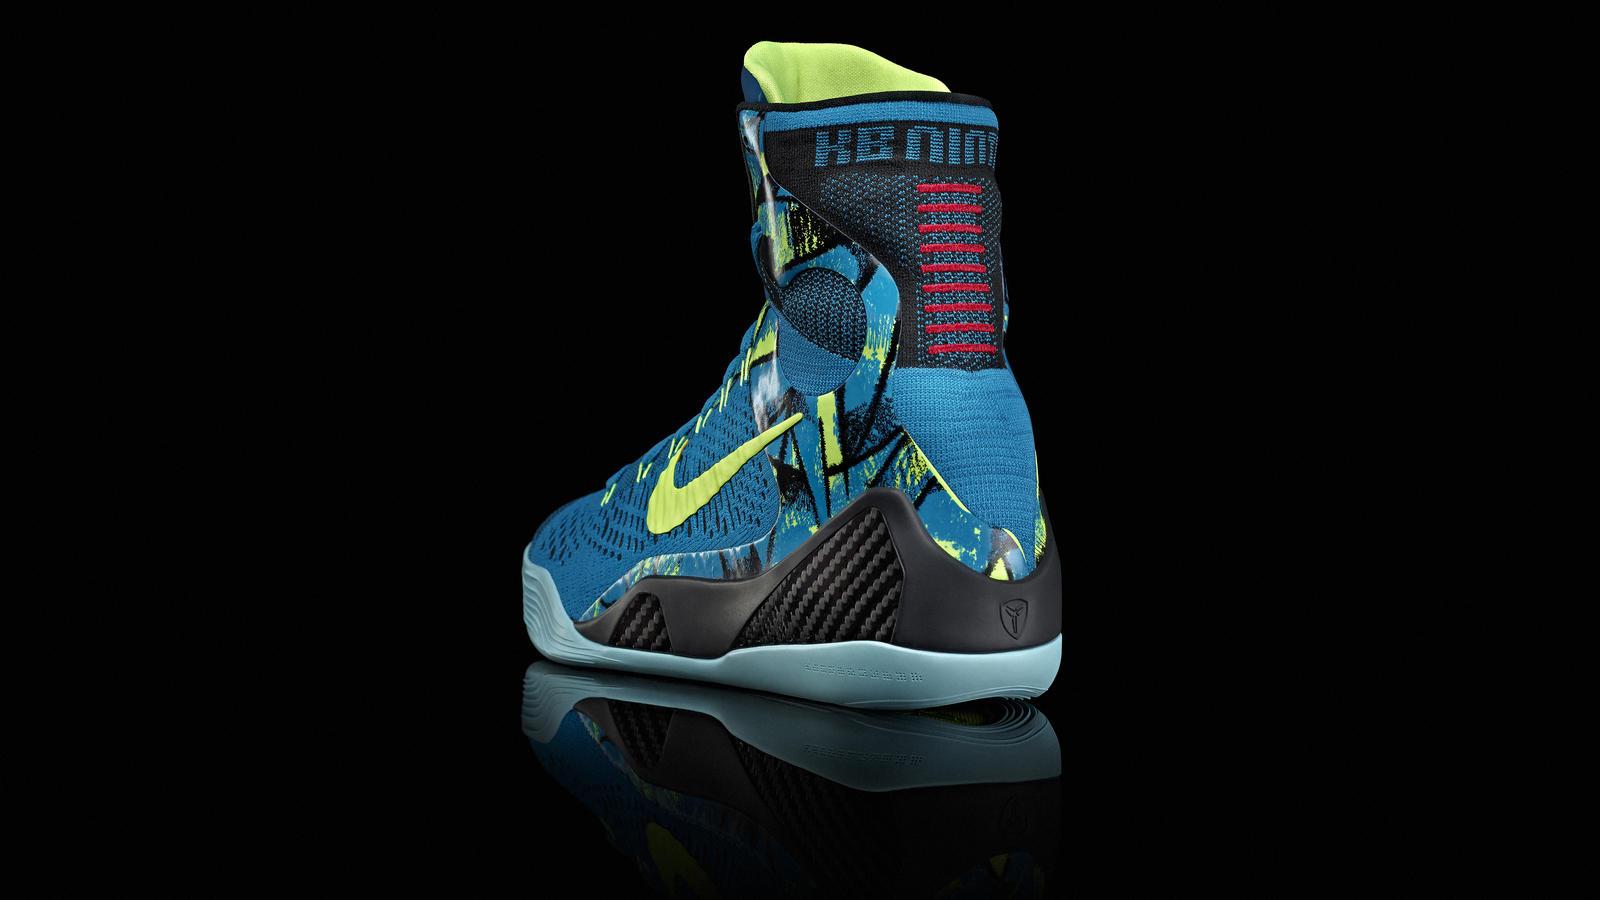 kobe 9 shoes